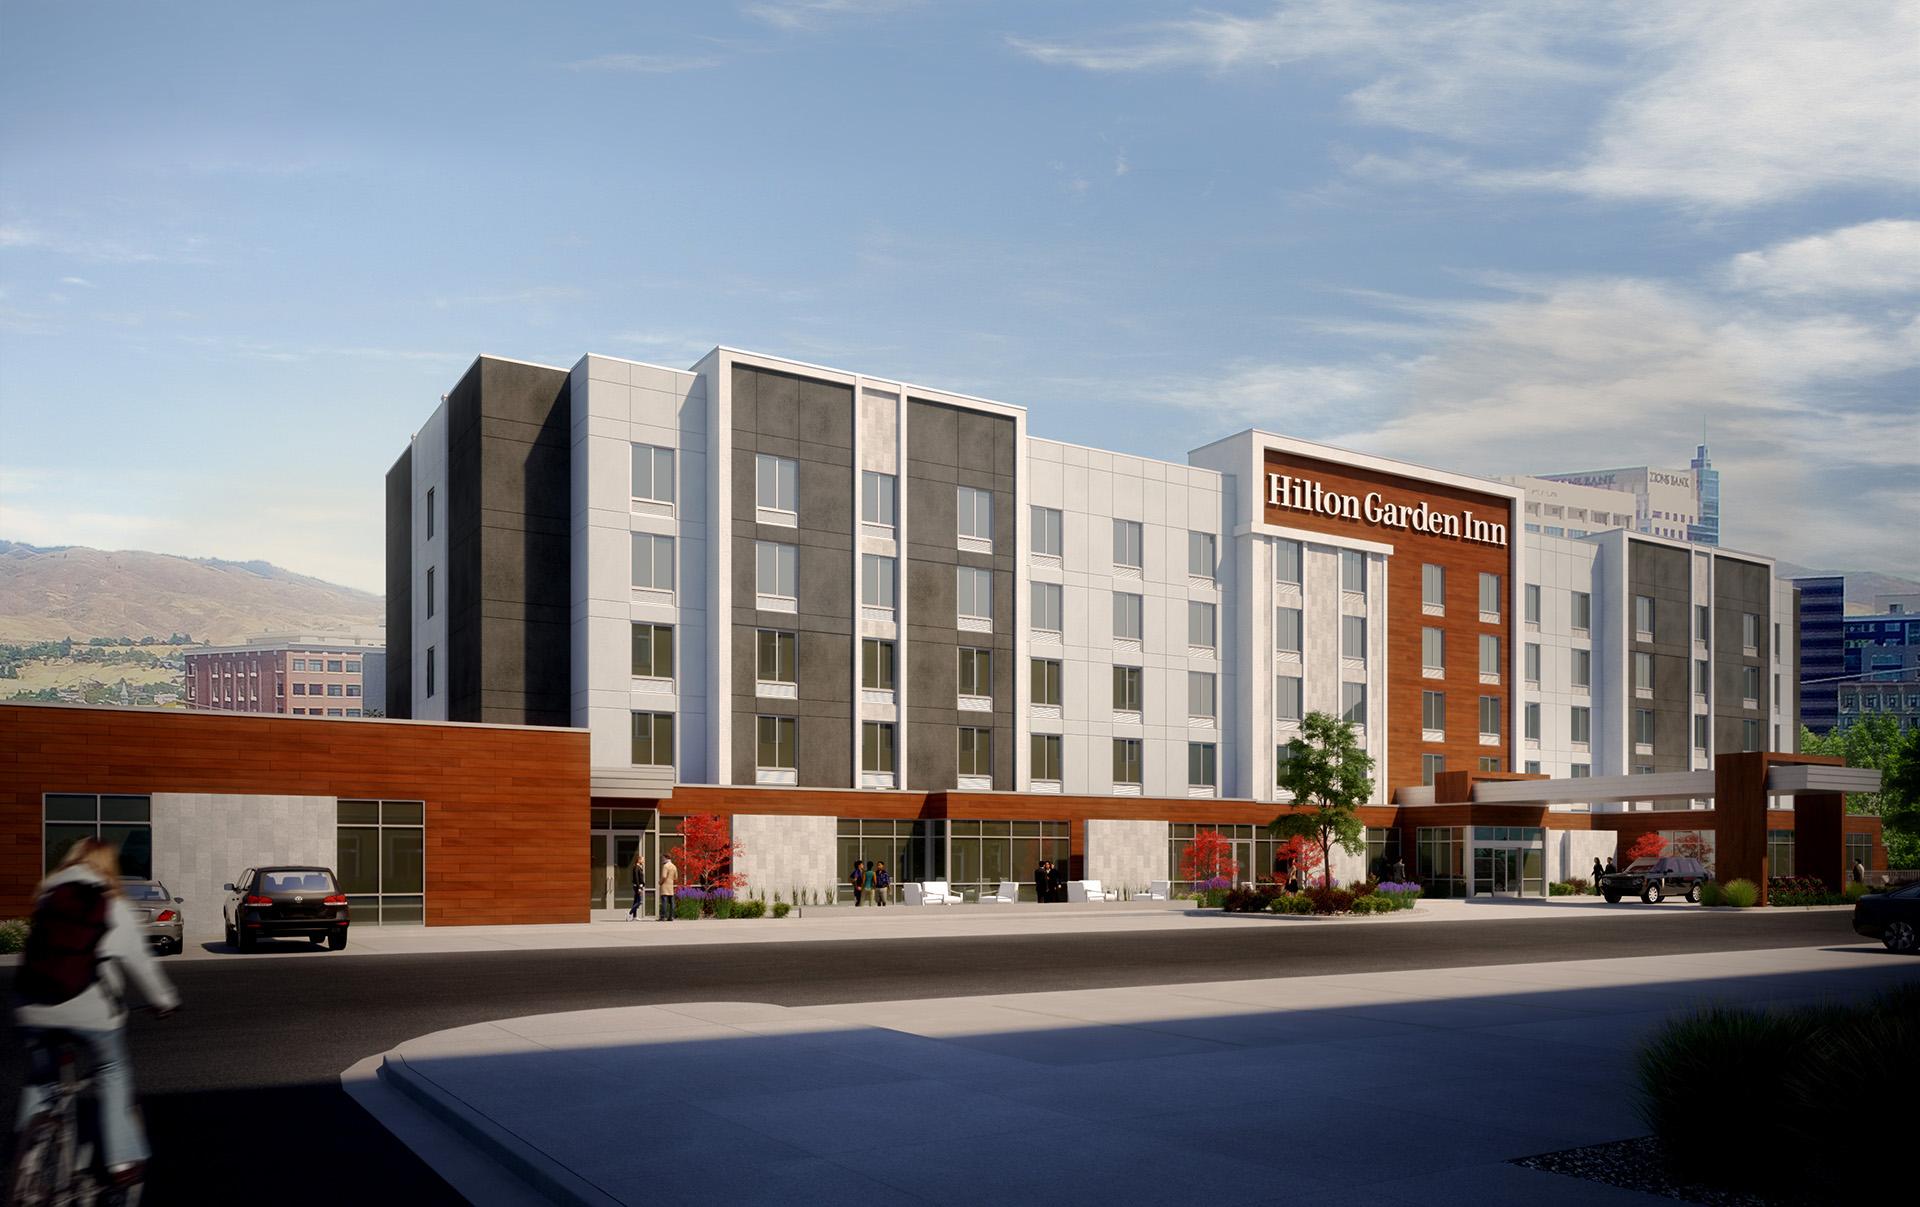 Hilton Garden Inn Boise Id Headwaters Construction Company